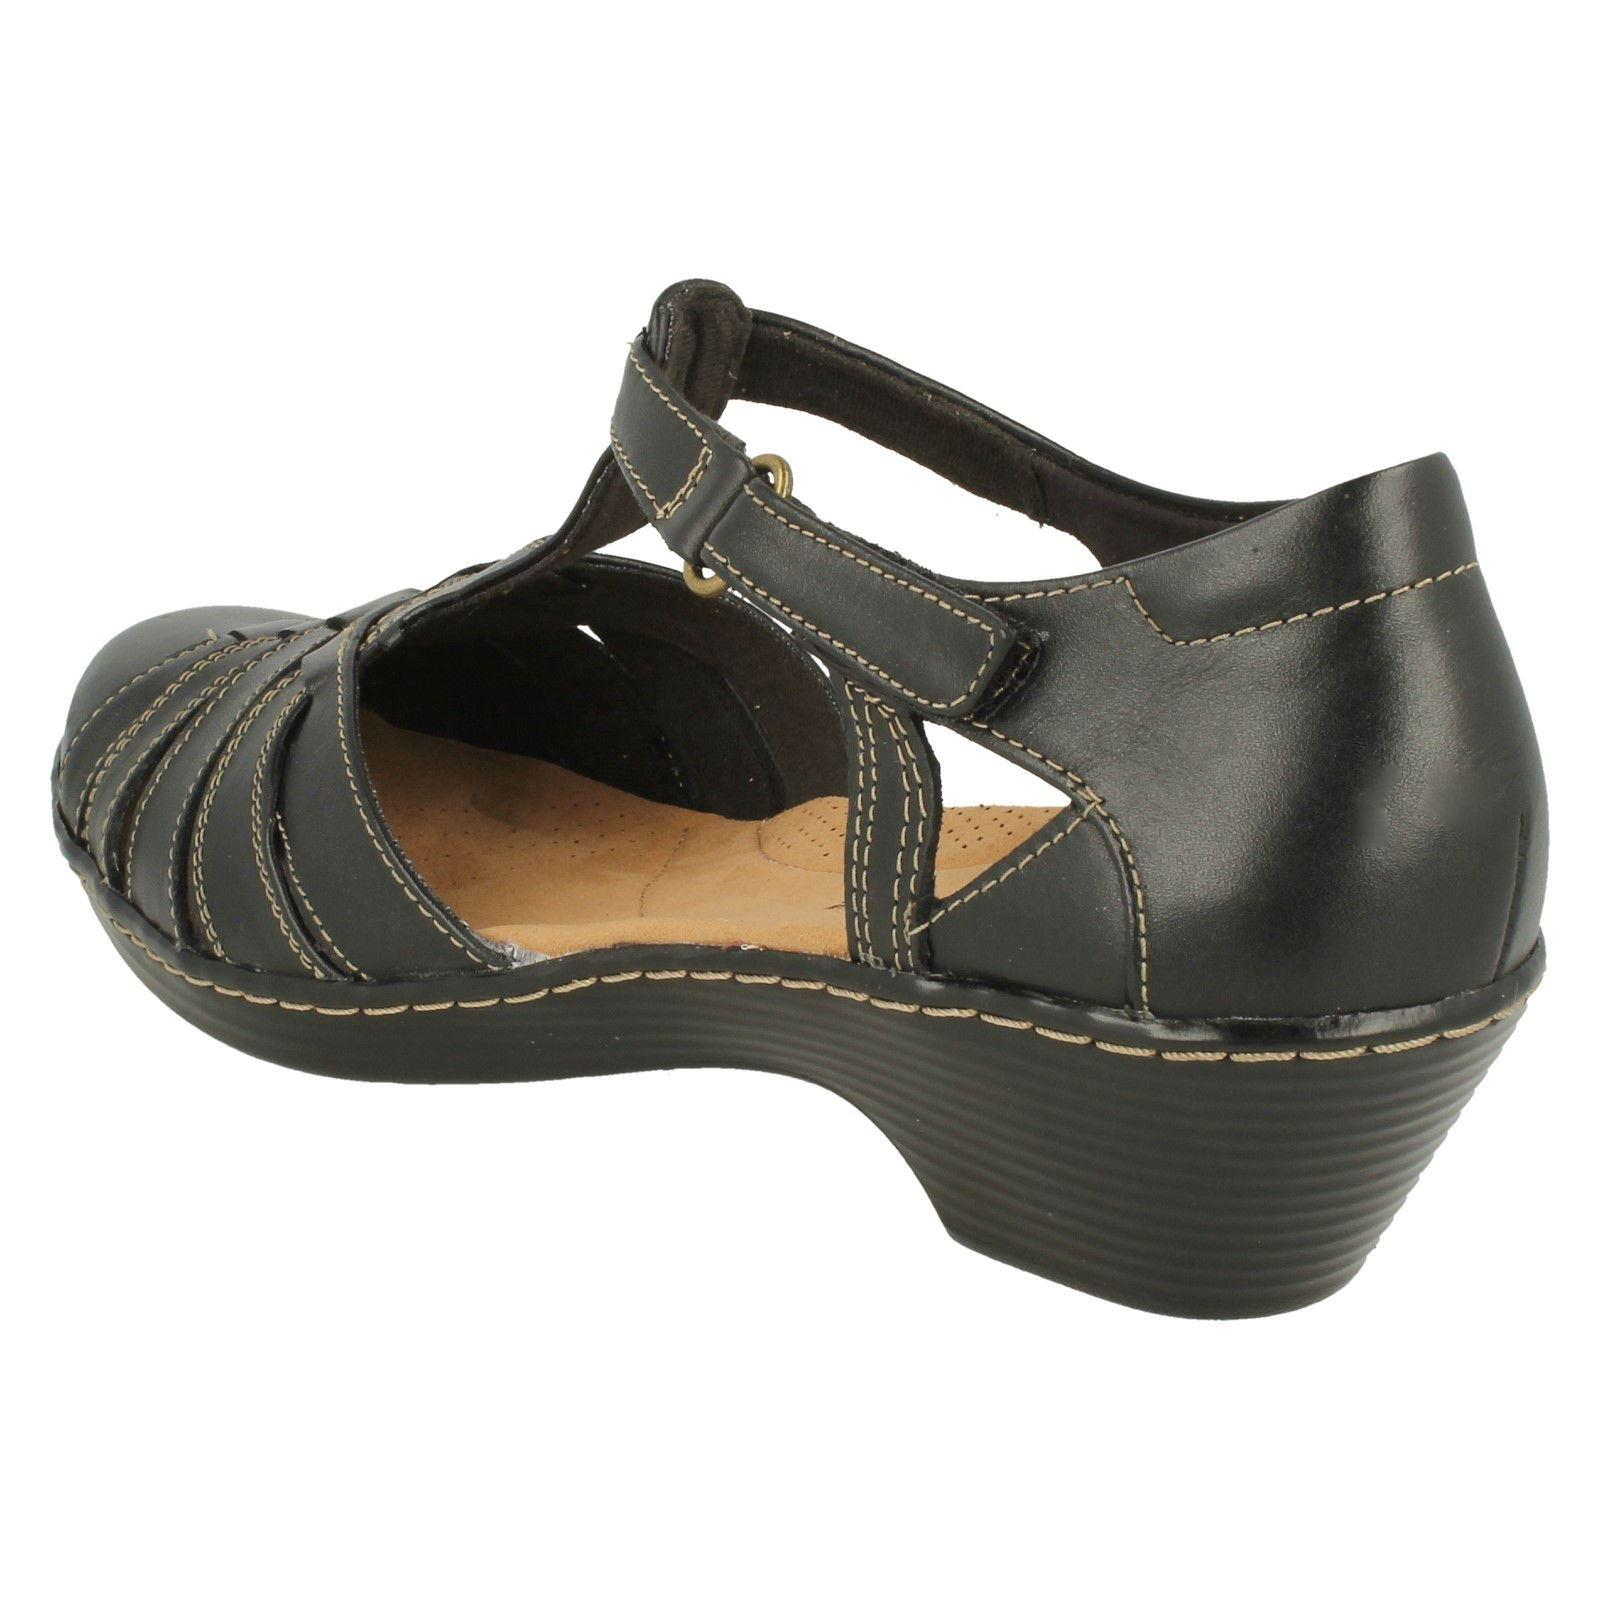 'Ladies Clarks' Scoop Wedge T-Bar shoes - Wendy Wendy Wendy Alto 918939